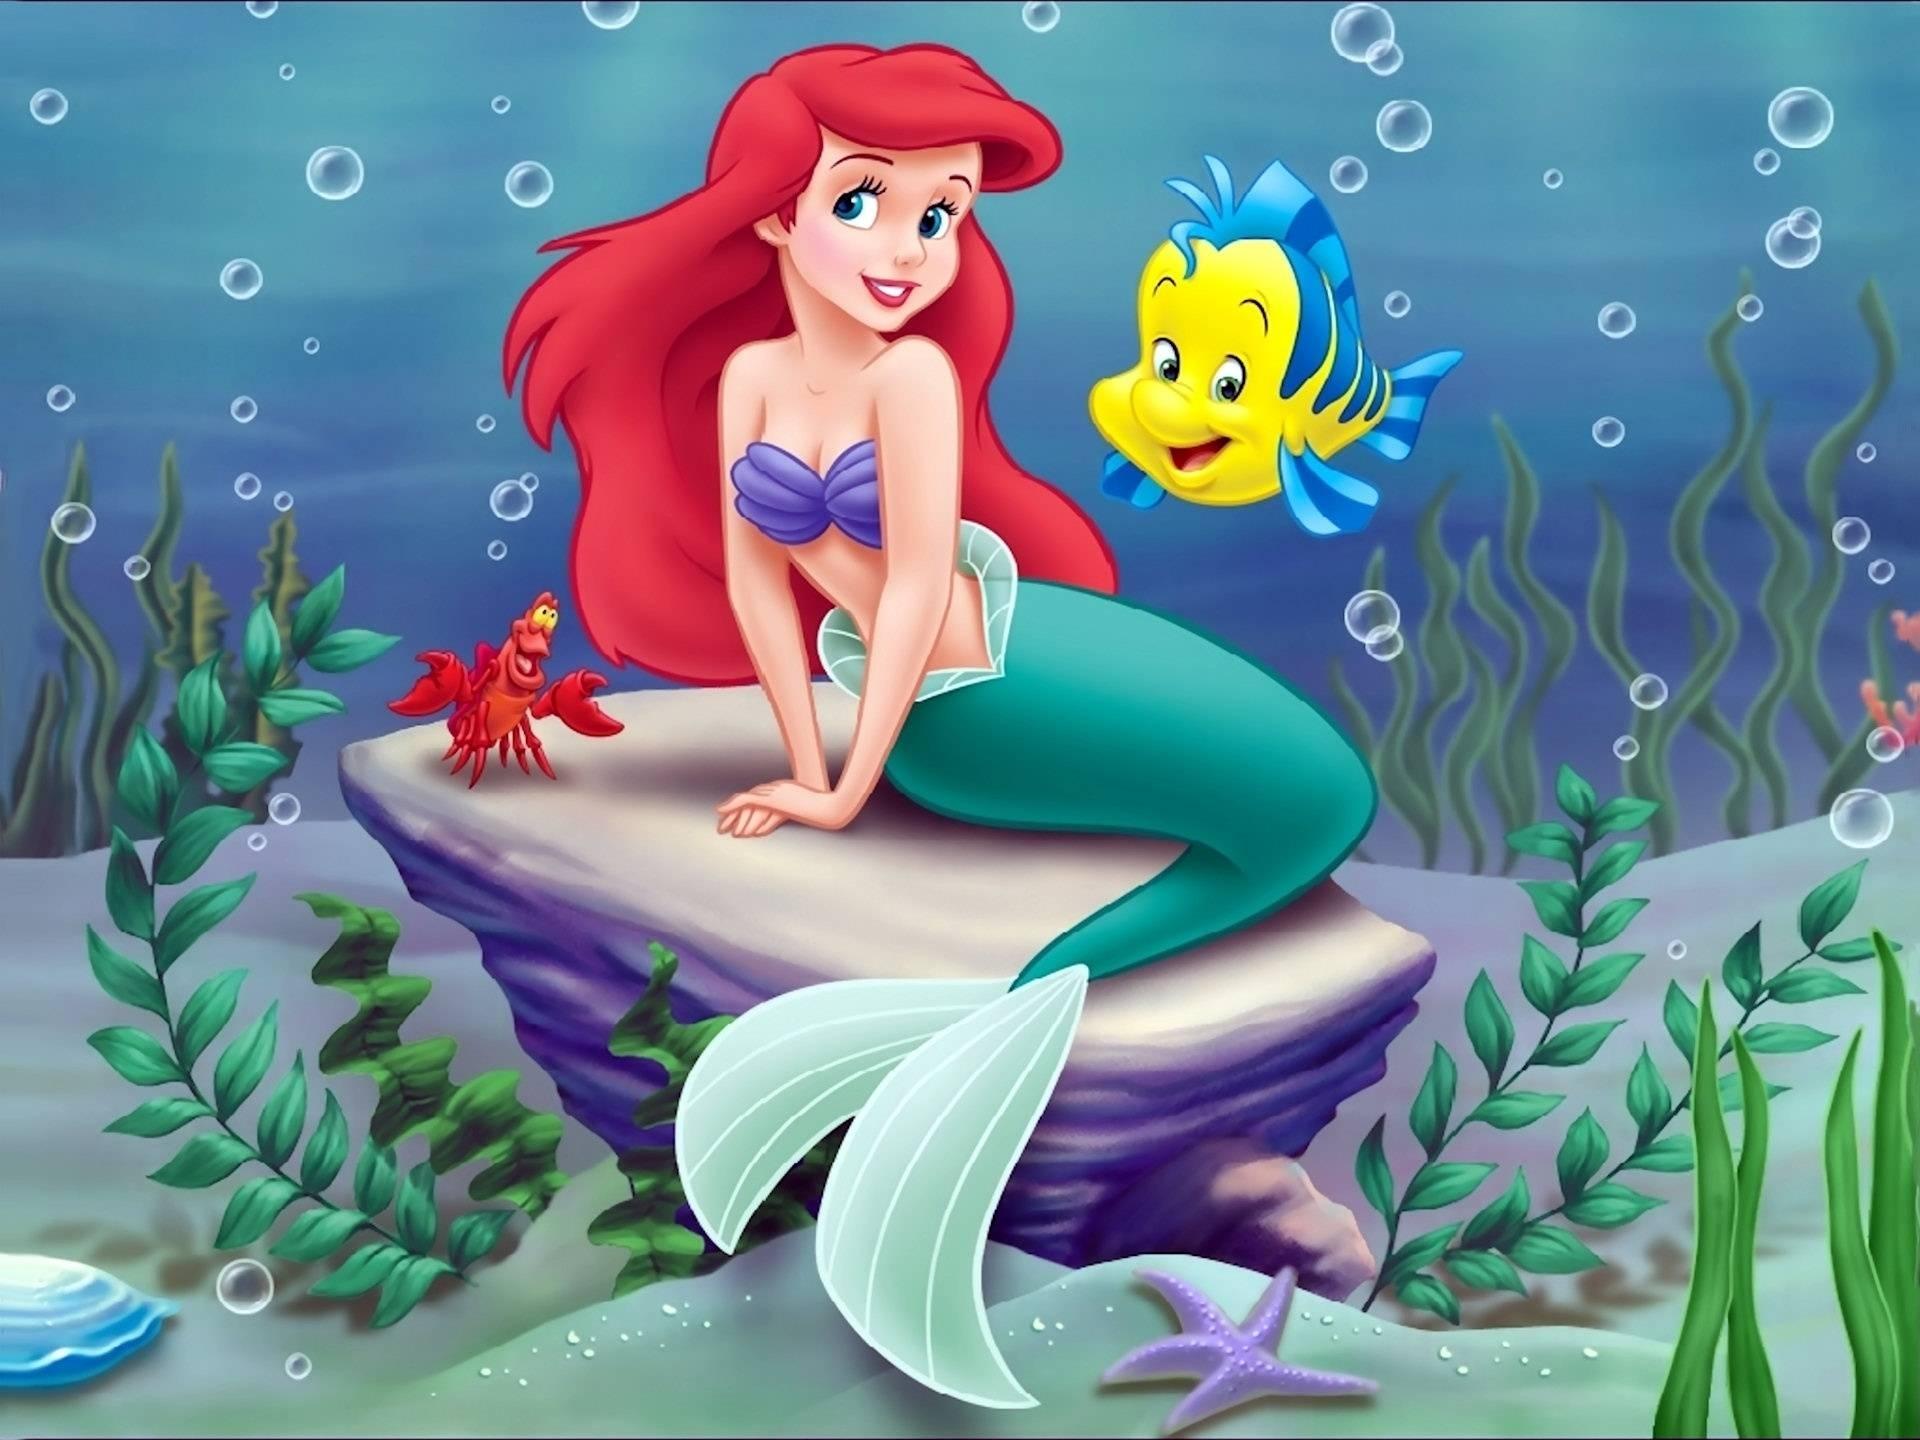 little mermaid disney wallpaper - mermaid wallpaper